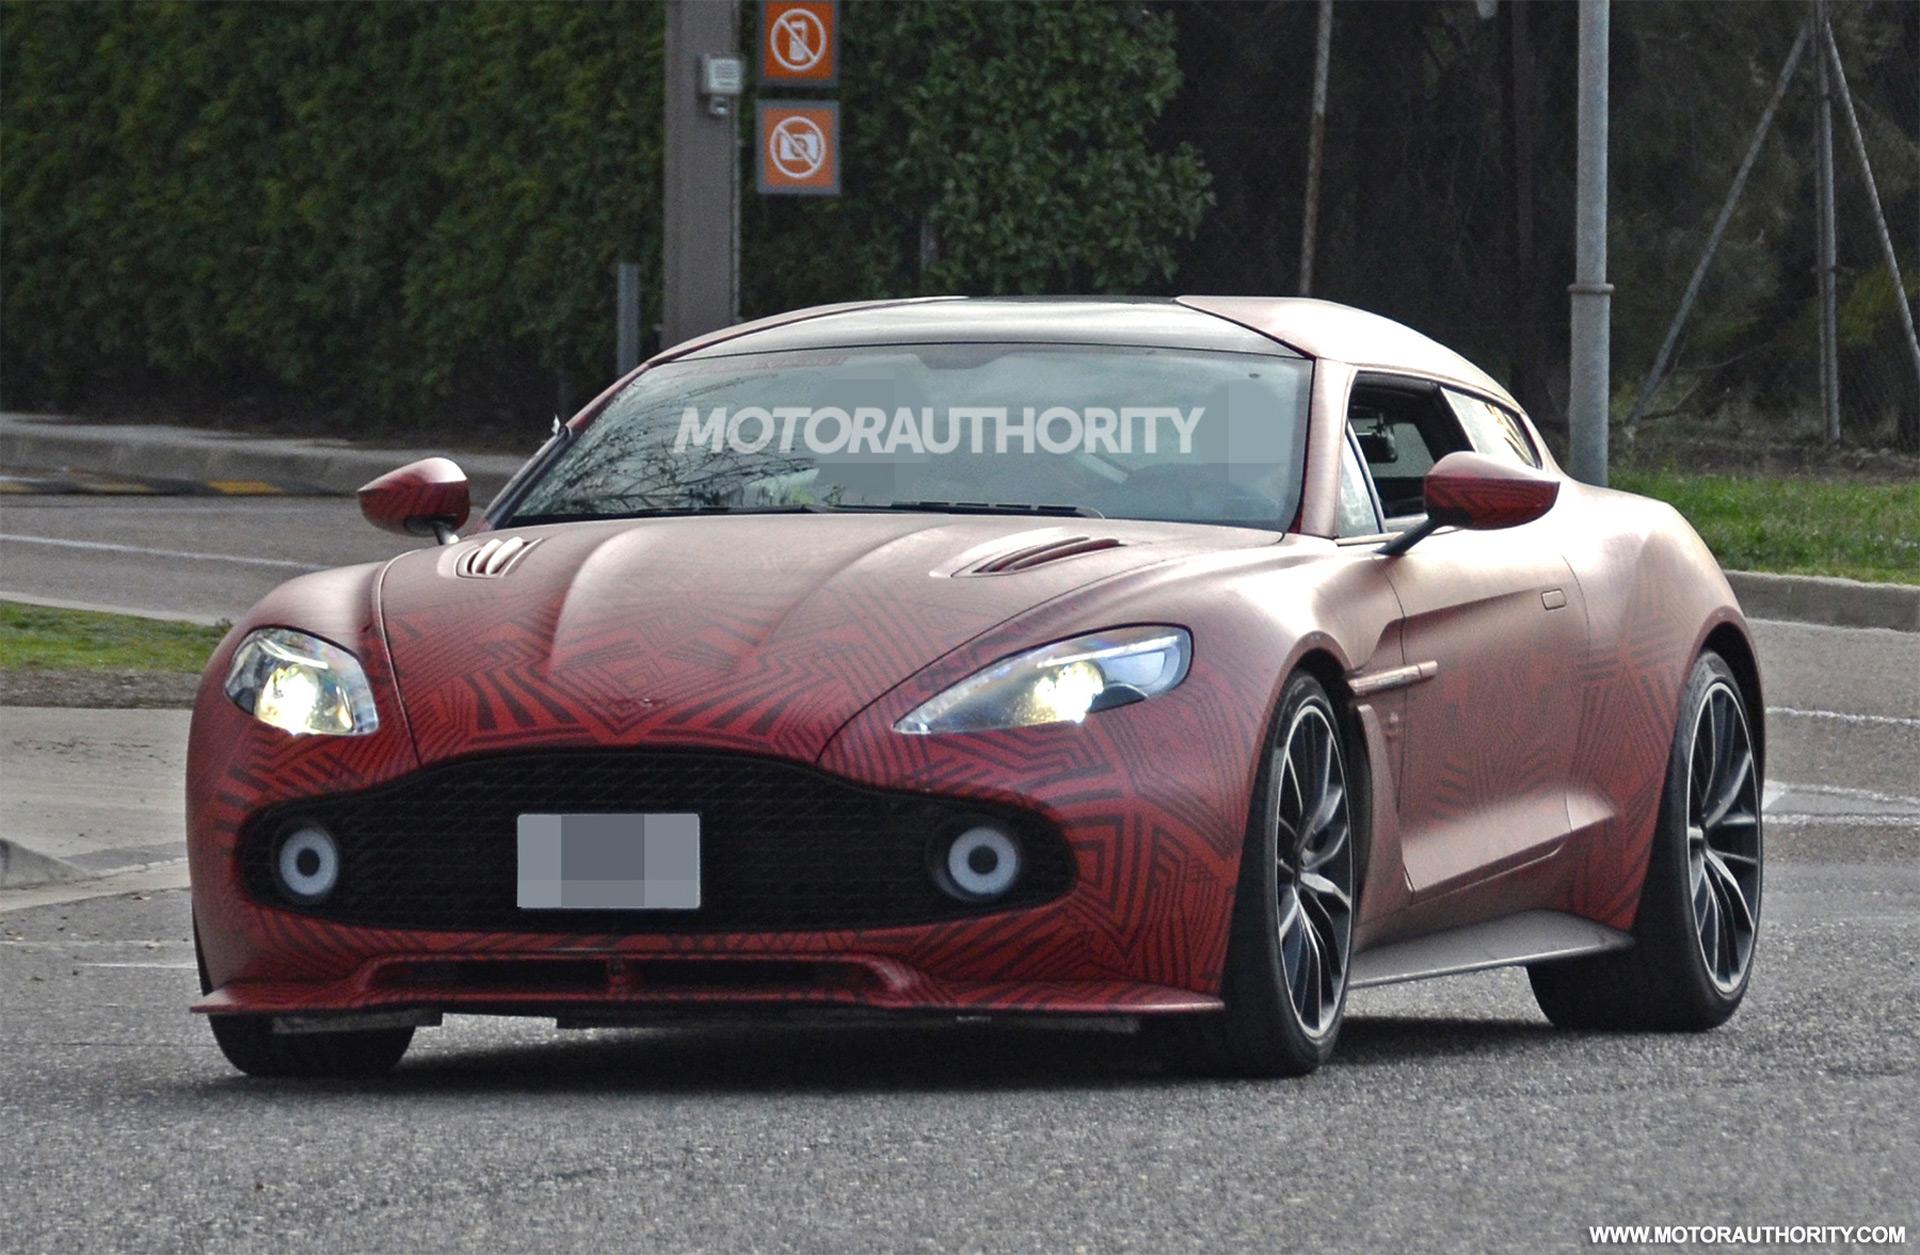 2012 - [Aston Martin] Vanquish [310] - Page 11 Aston-martin-vanquish-zagato-shooting-brake-spy-shots--image-via-s-baldauf-sb-medien_100684624_h